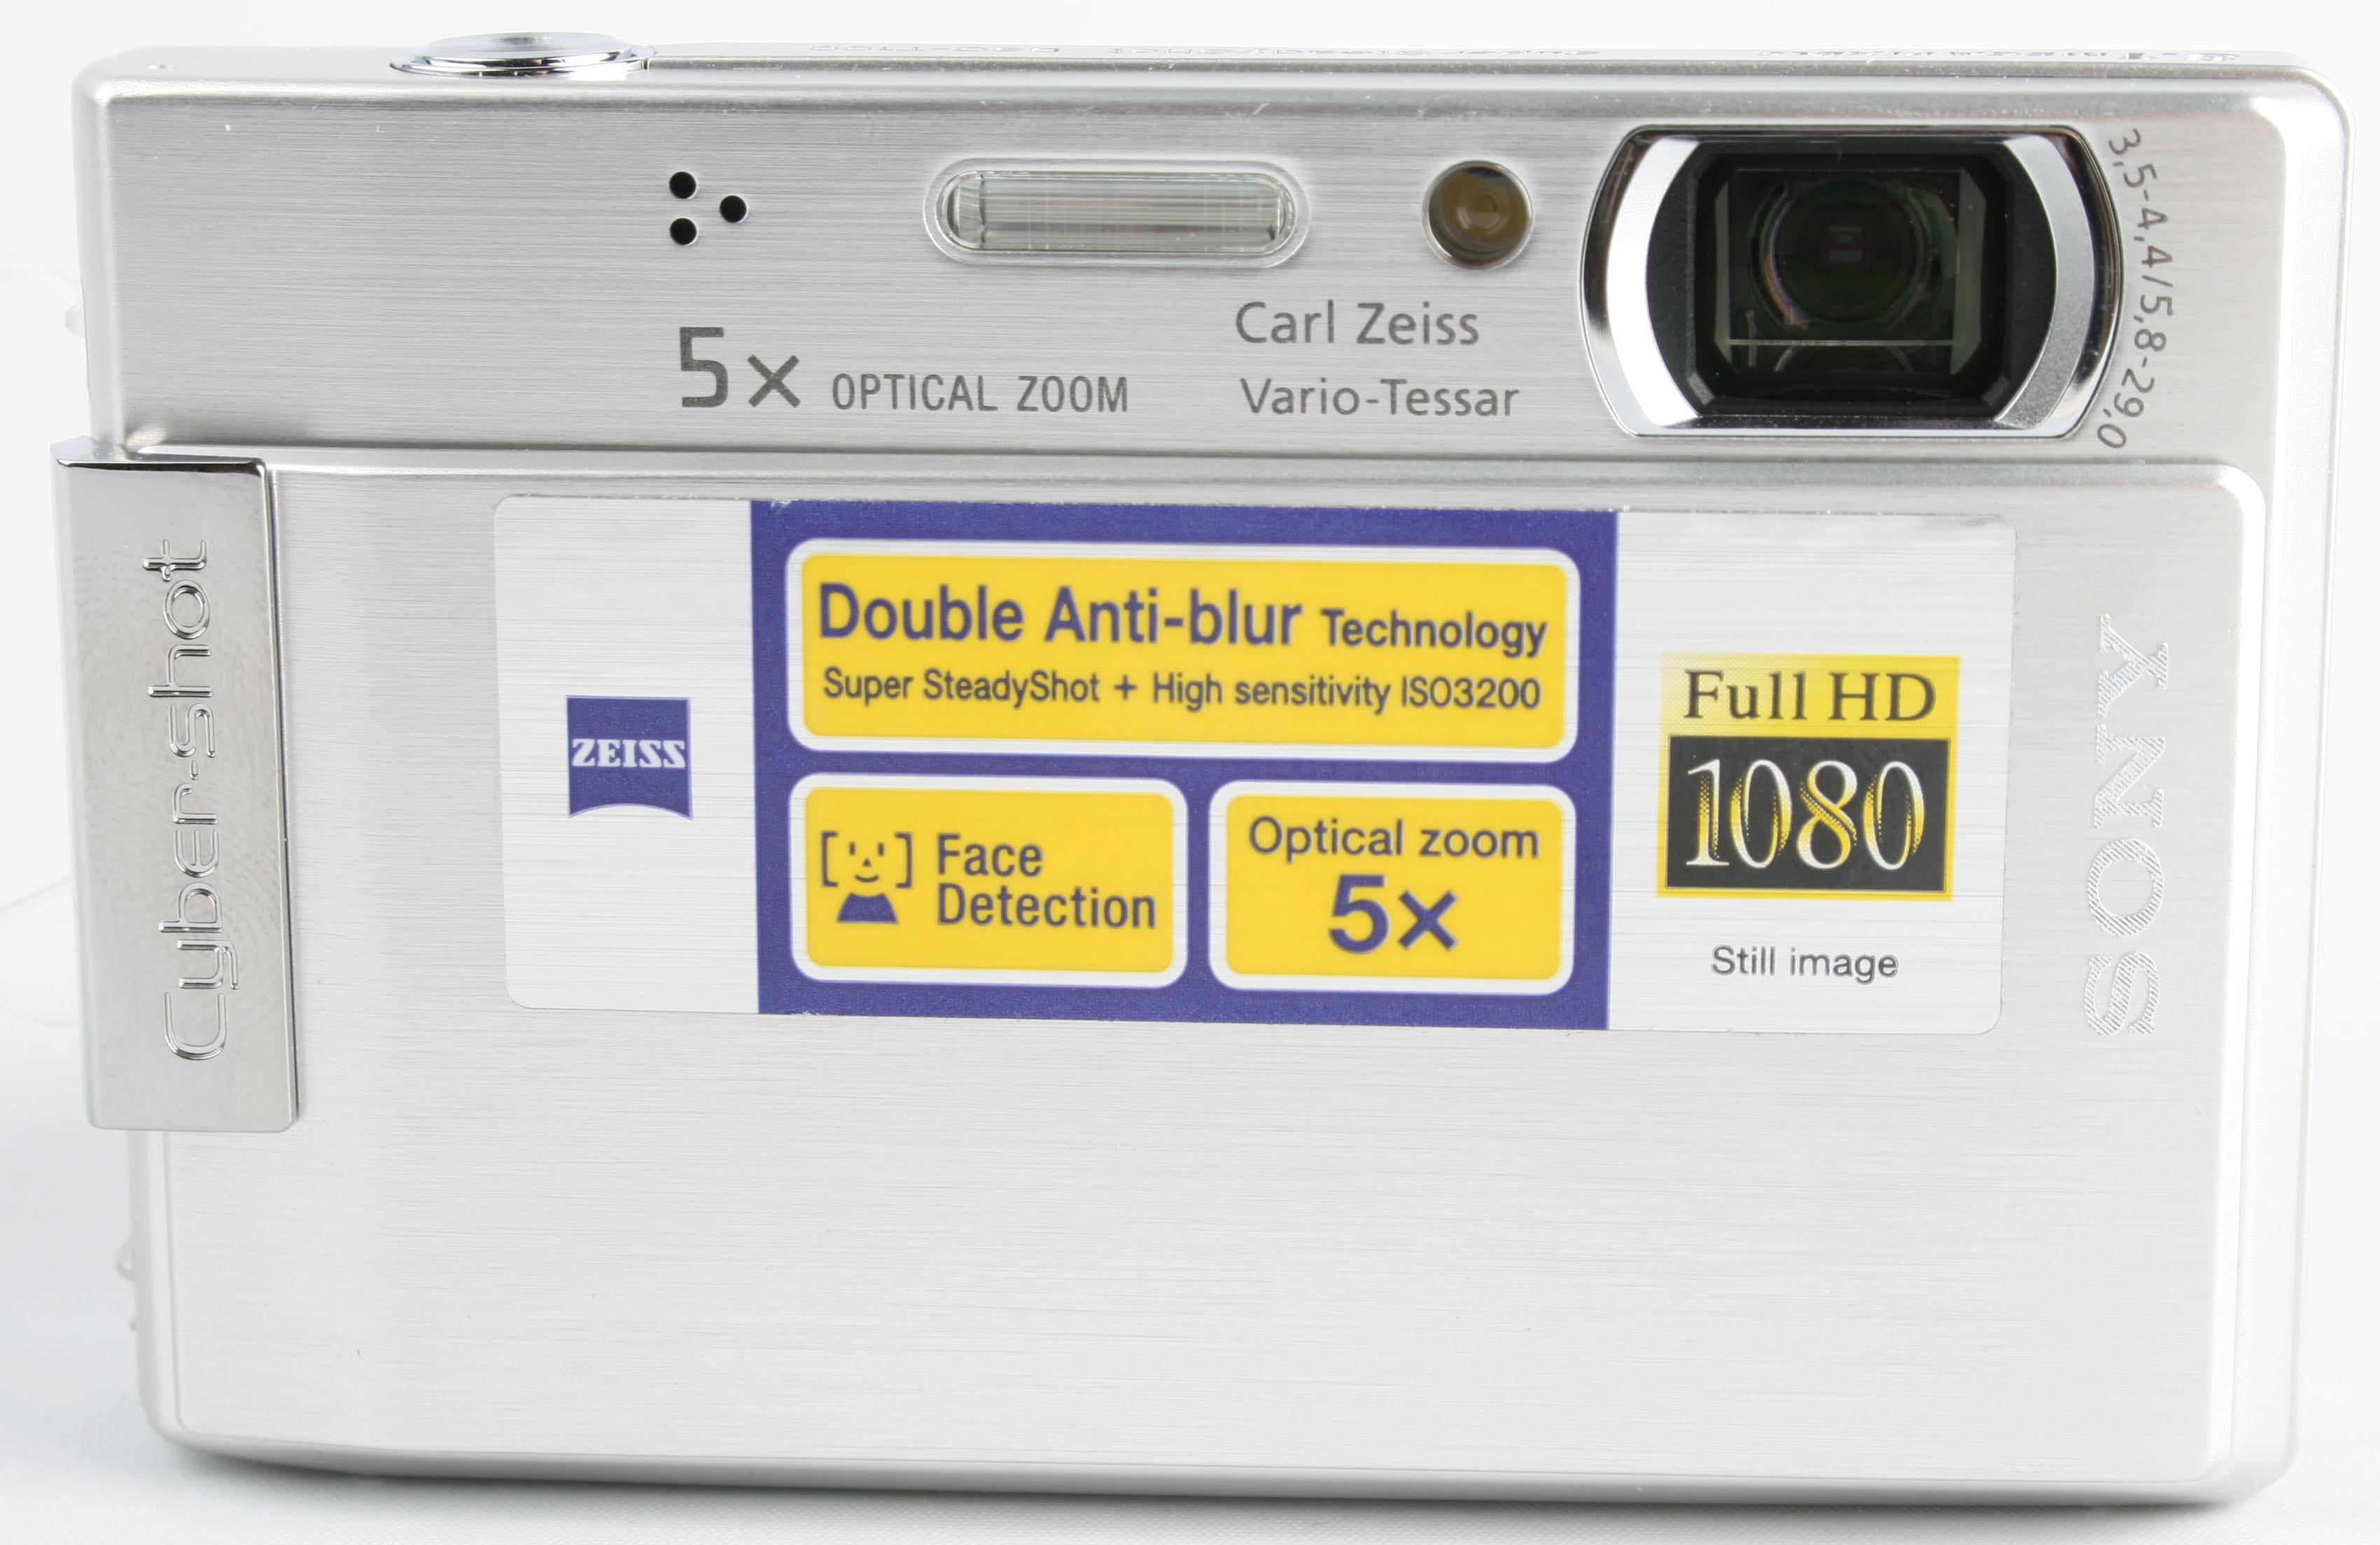 sony dsc t100 digital camera review rh ephotozine com Sony's Cyber-shot User Guide Sony Cyber-shot Instruction Book